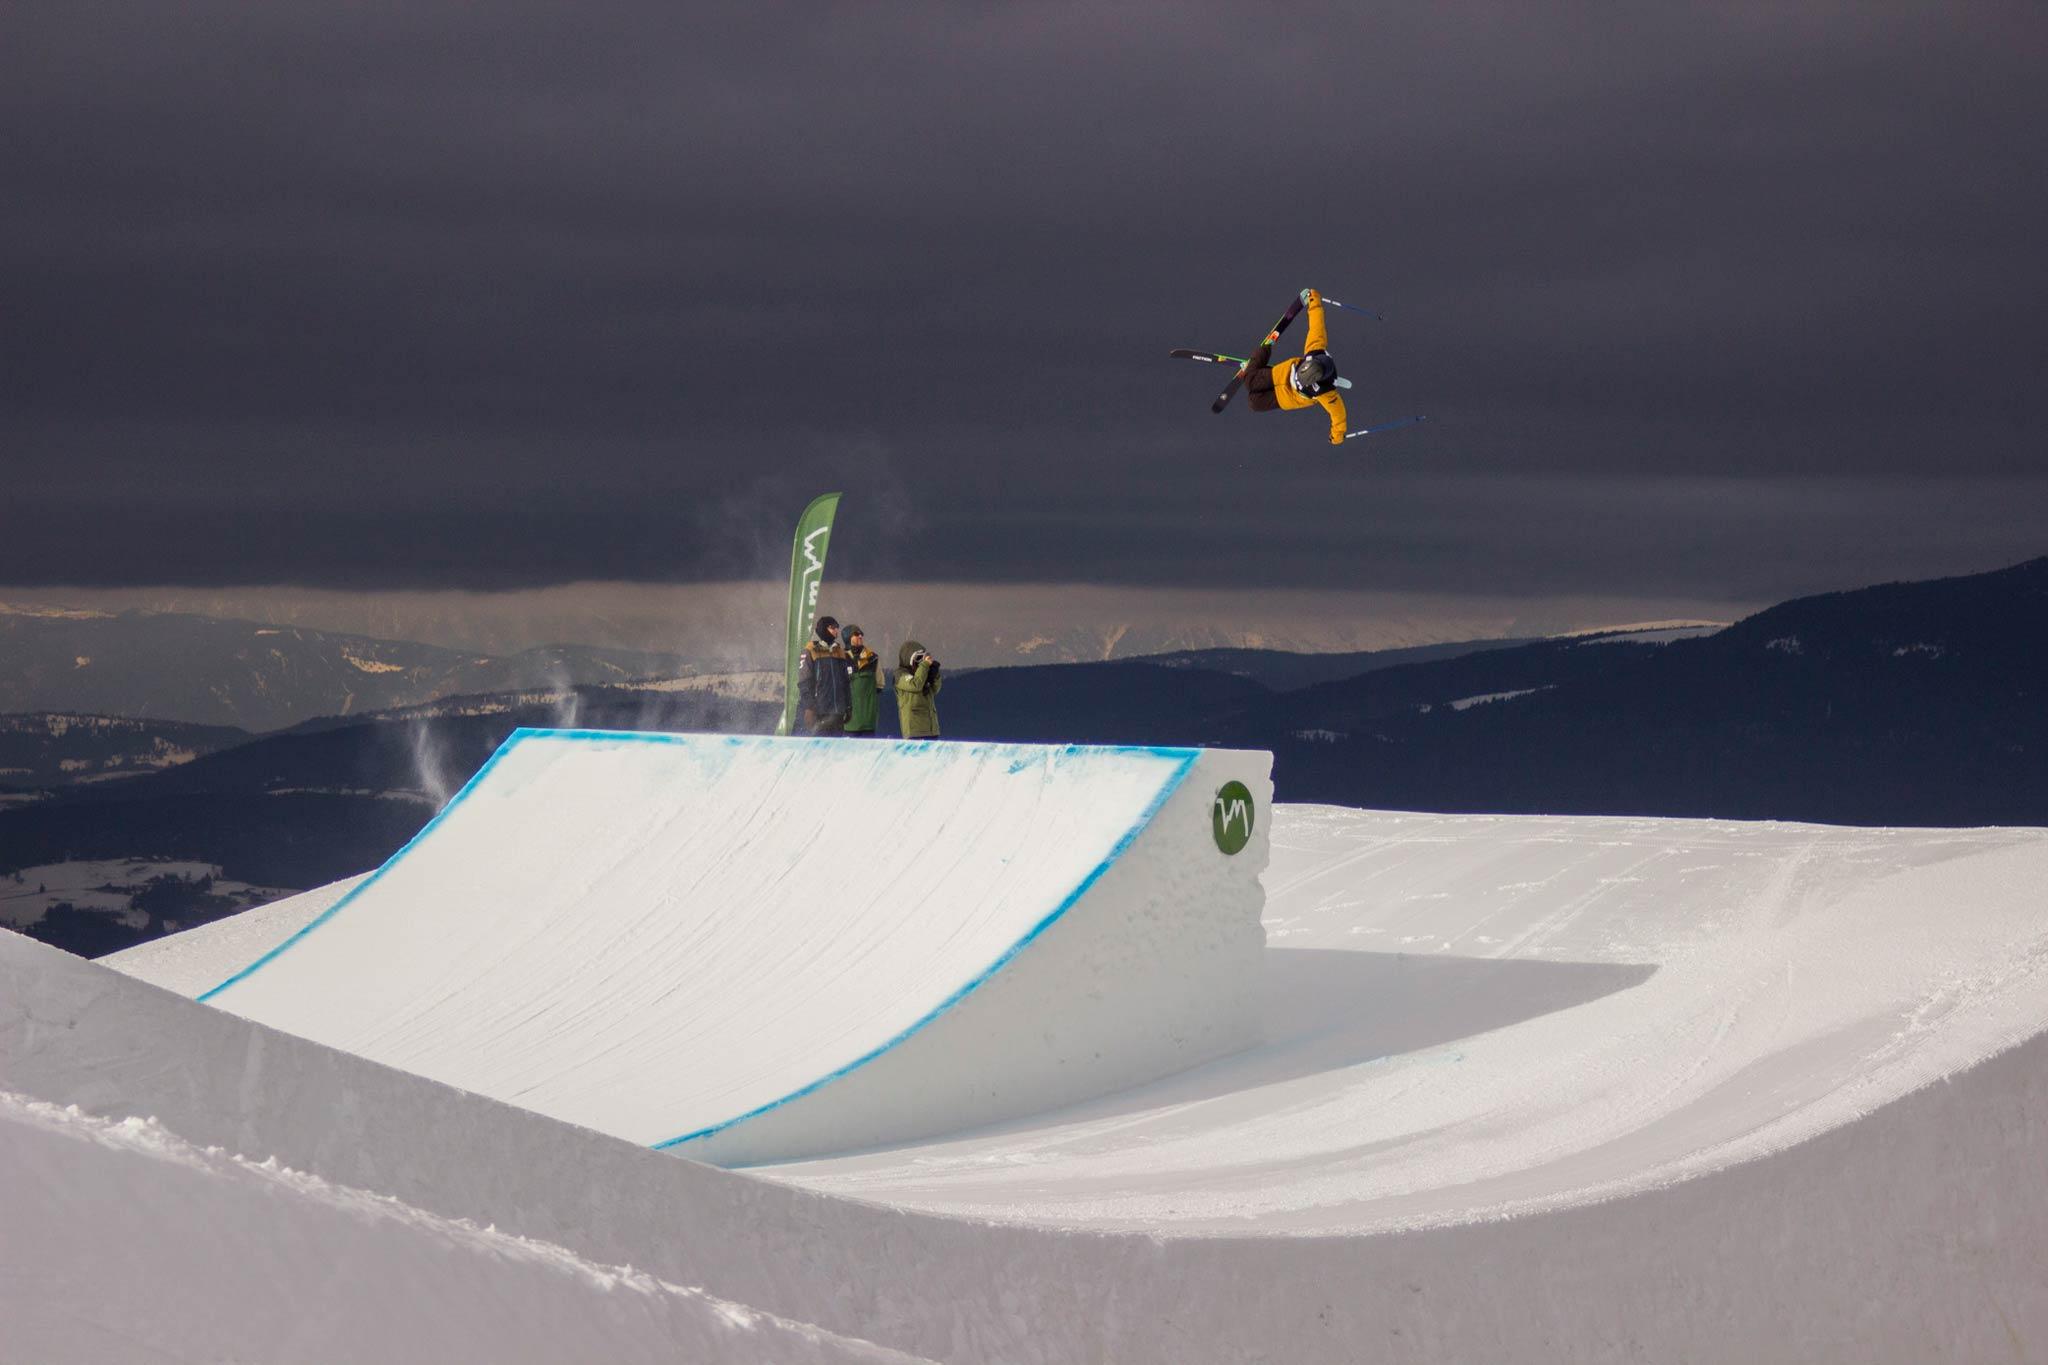 FIS Freestyle Slopestyle Worldcup 18/19 Seiser Alm - Foto: Seiser Alm